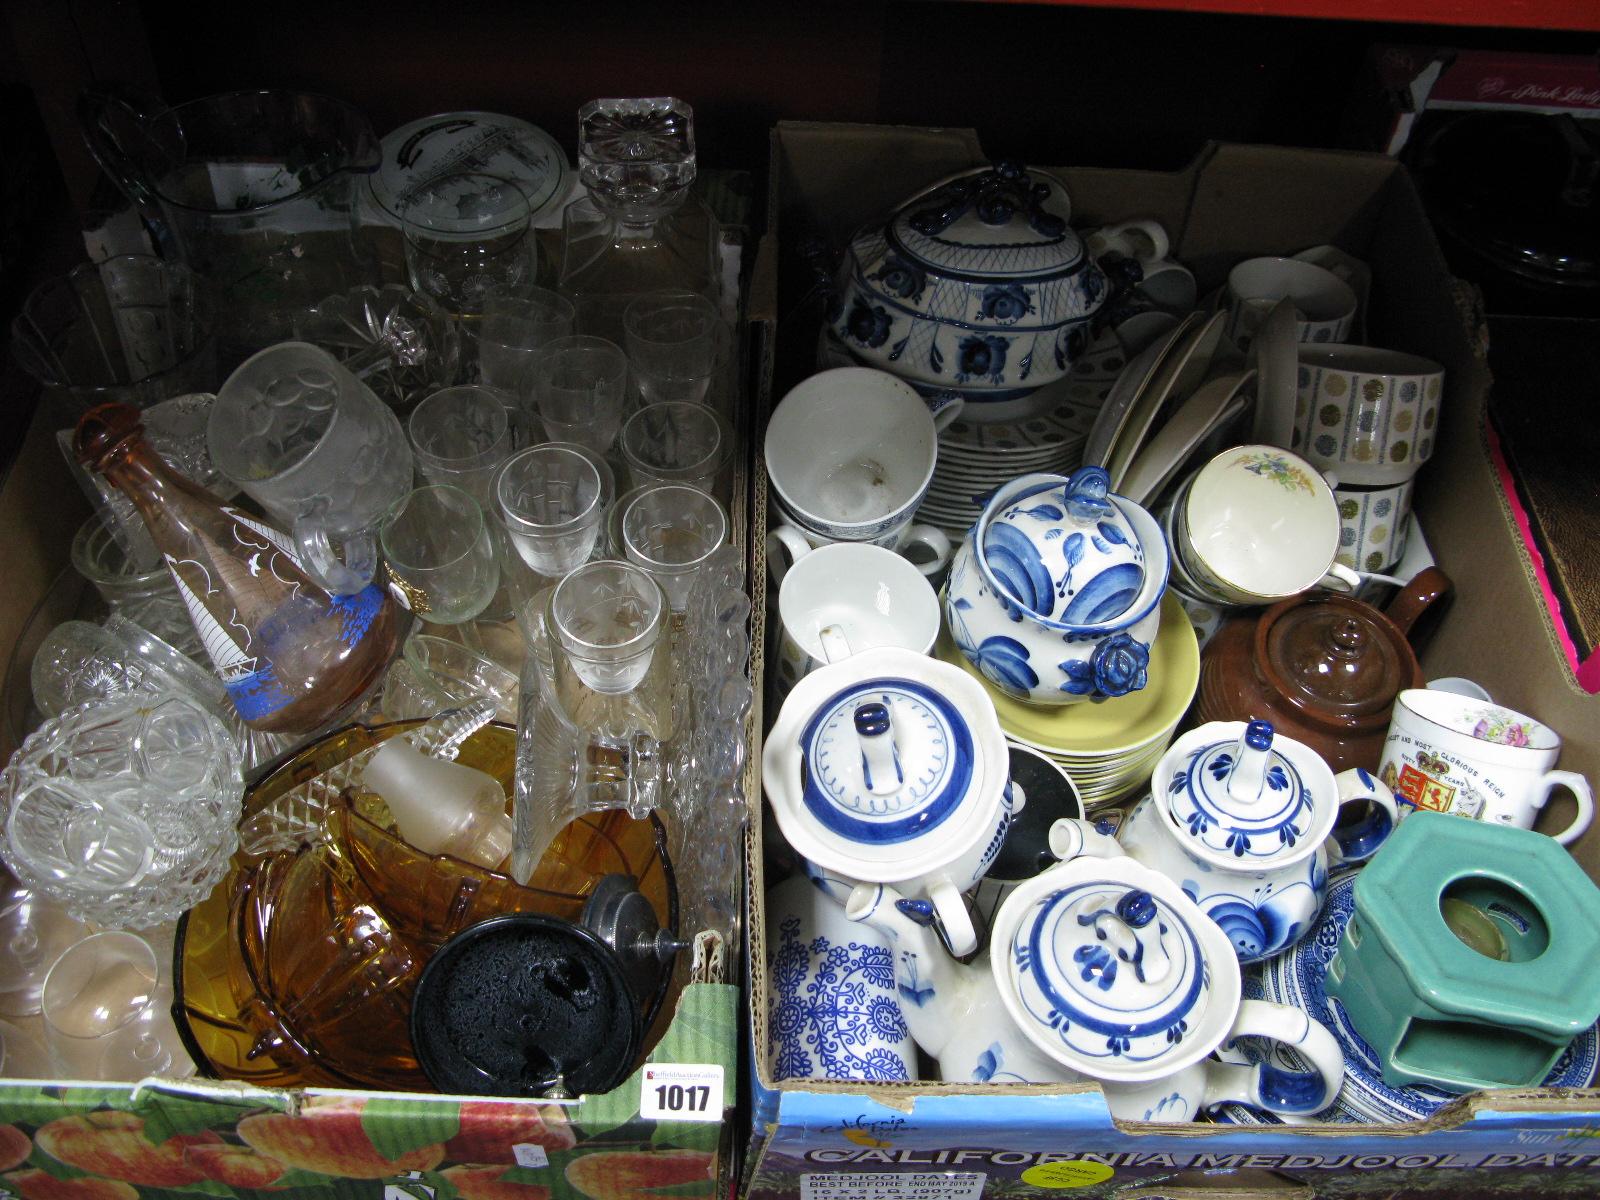 Lot 1017 - Quantity of Glassware, Midwinter tableware, ceramics:- Two Boxes